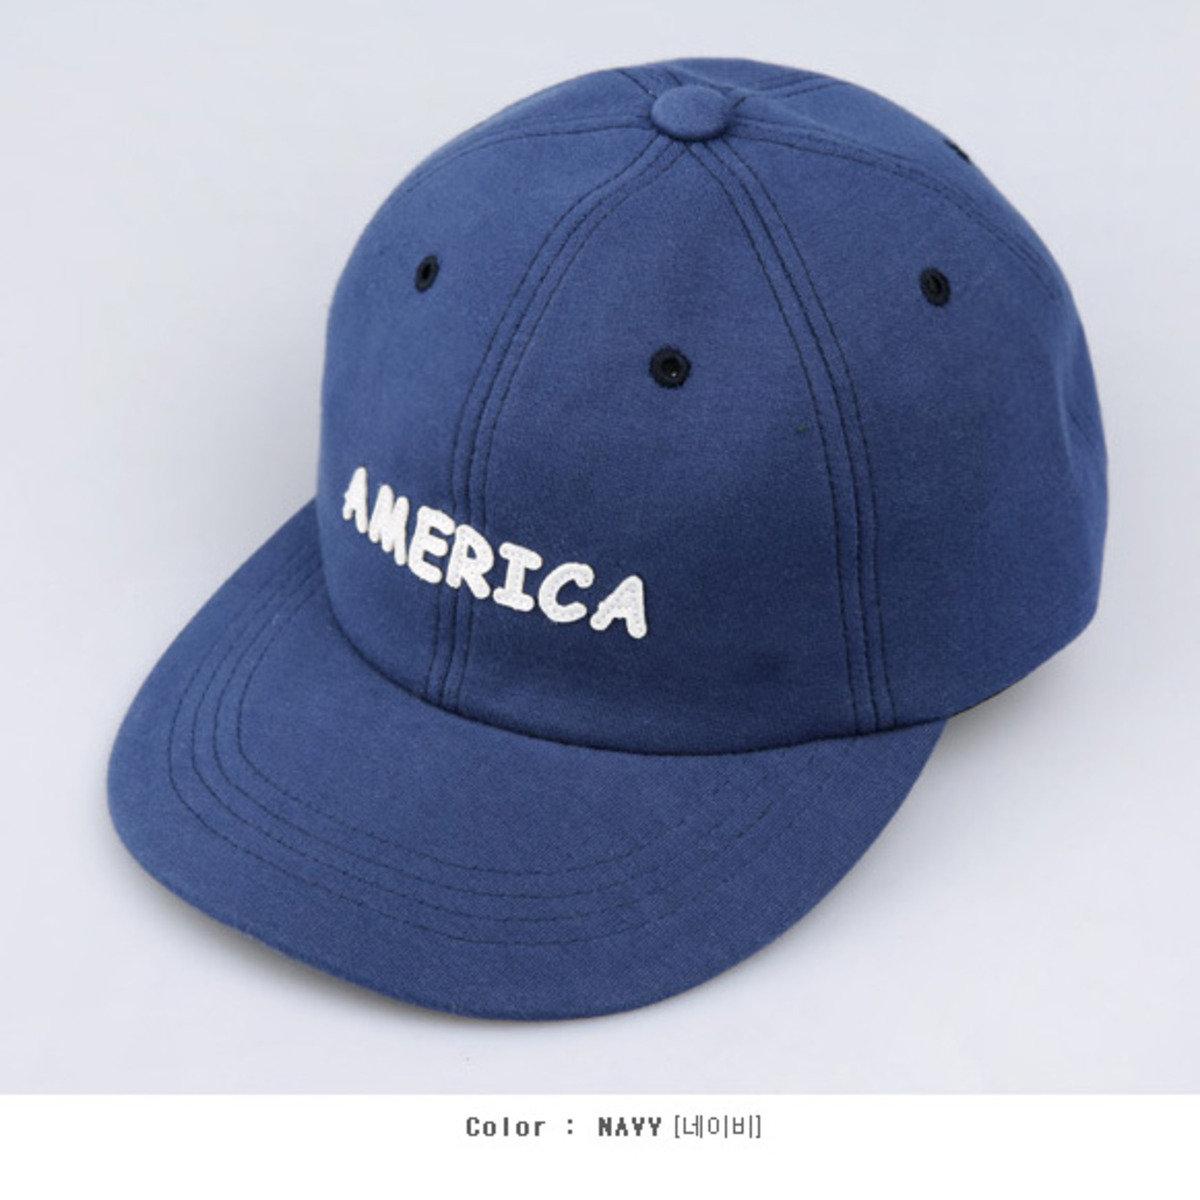 America 棒球帽_CA1_160219720